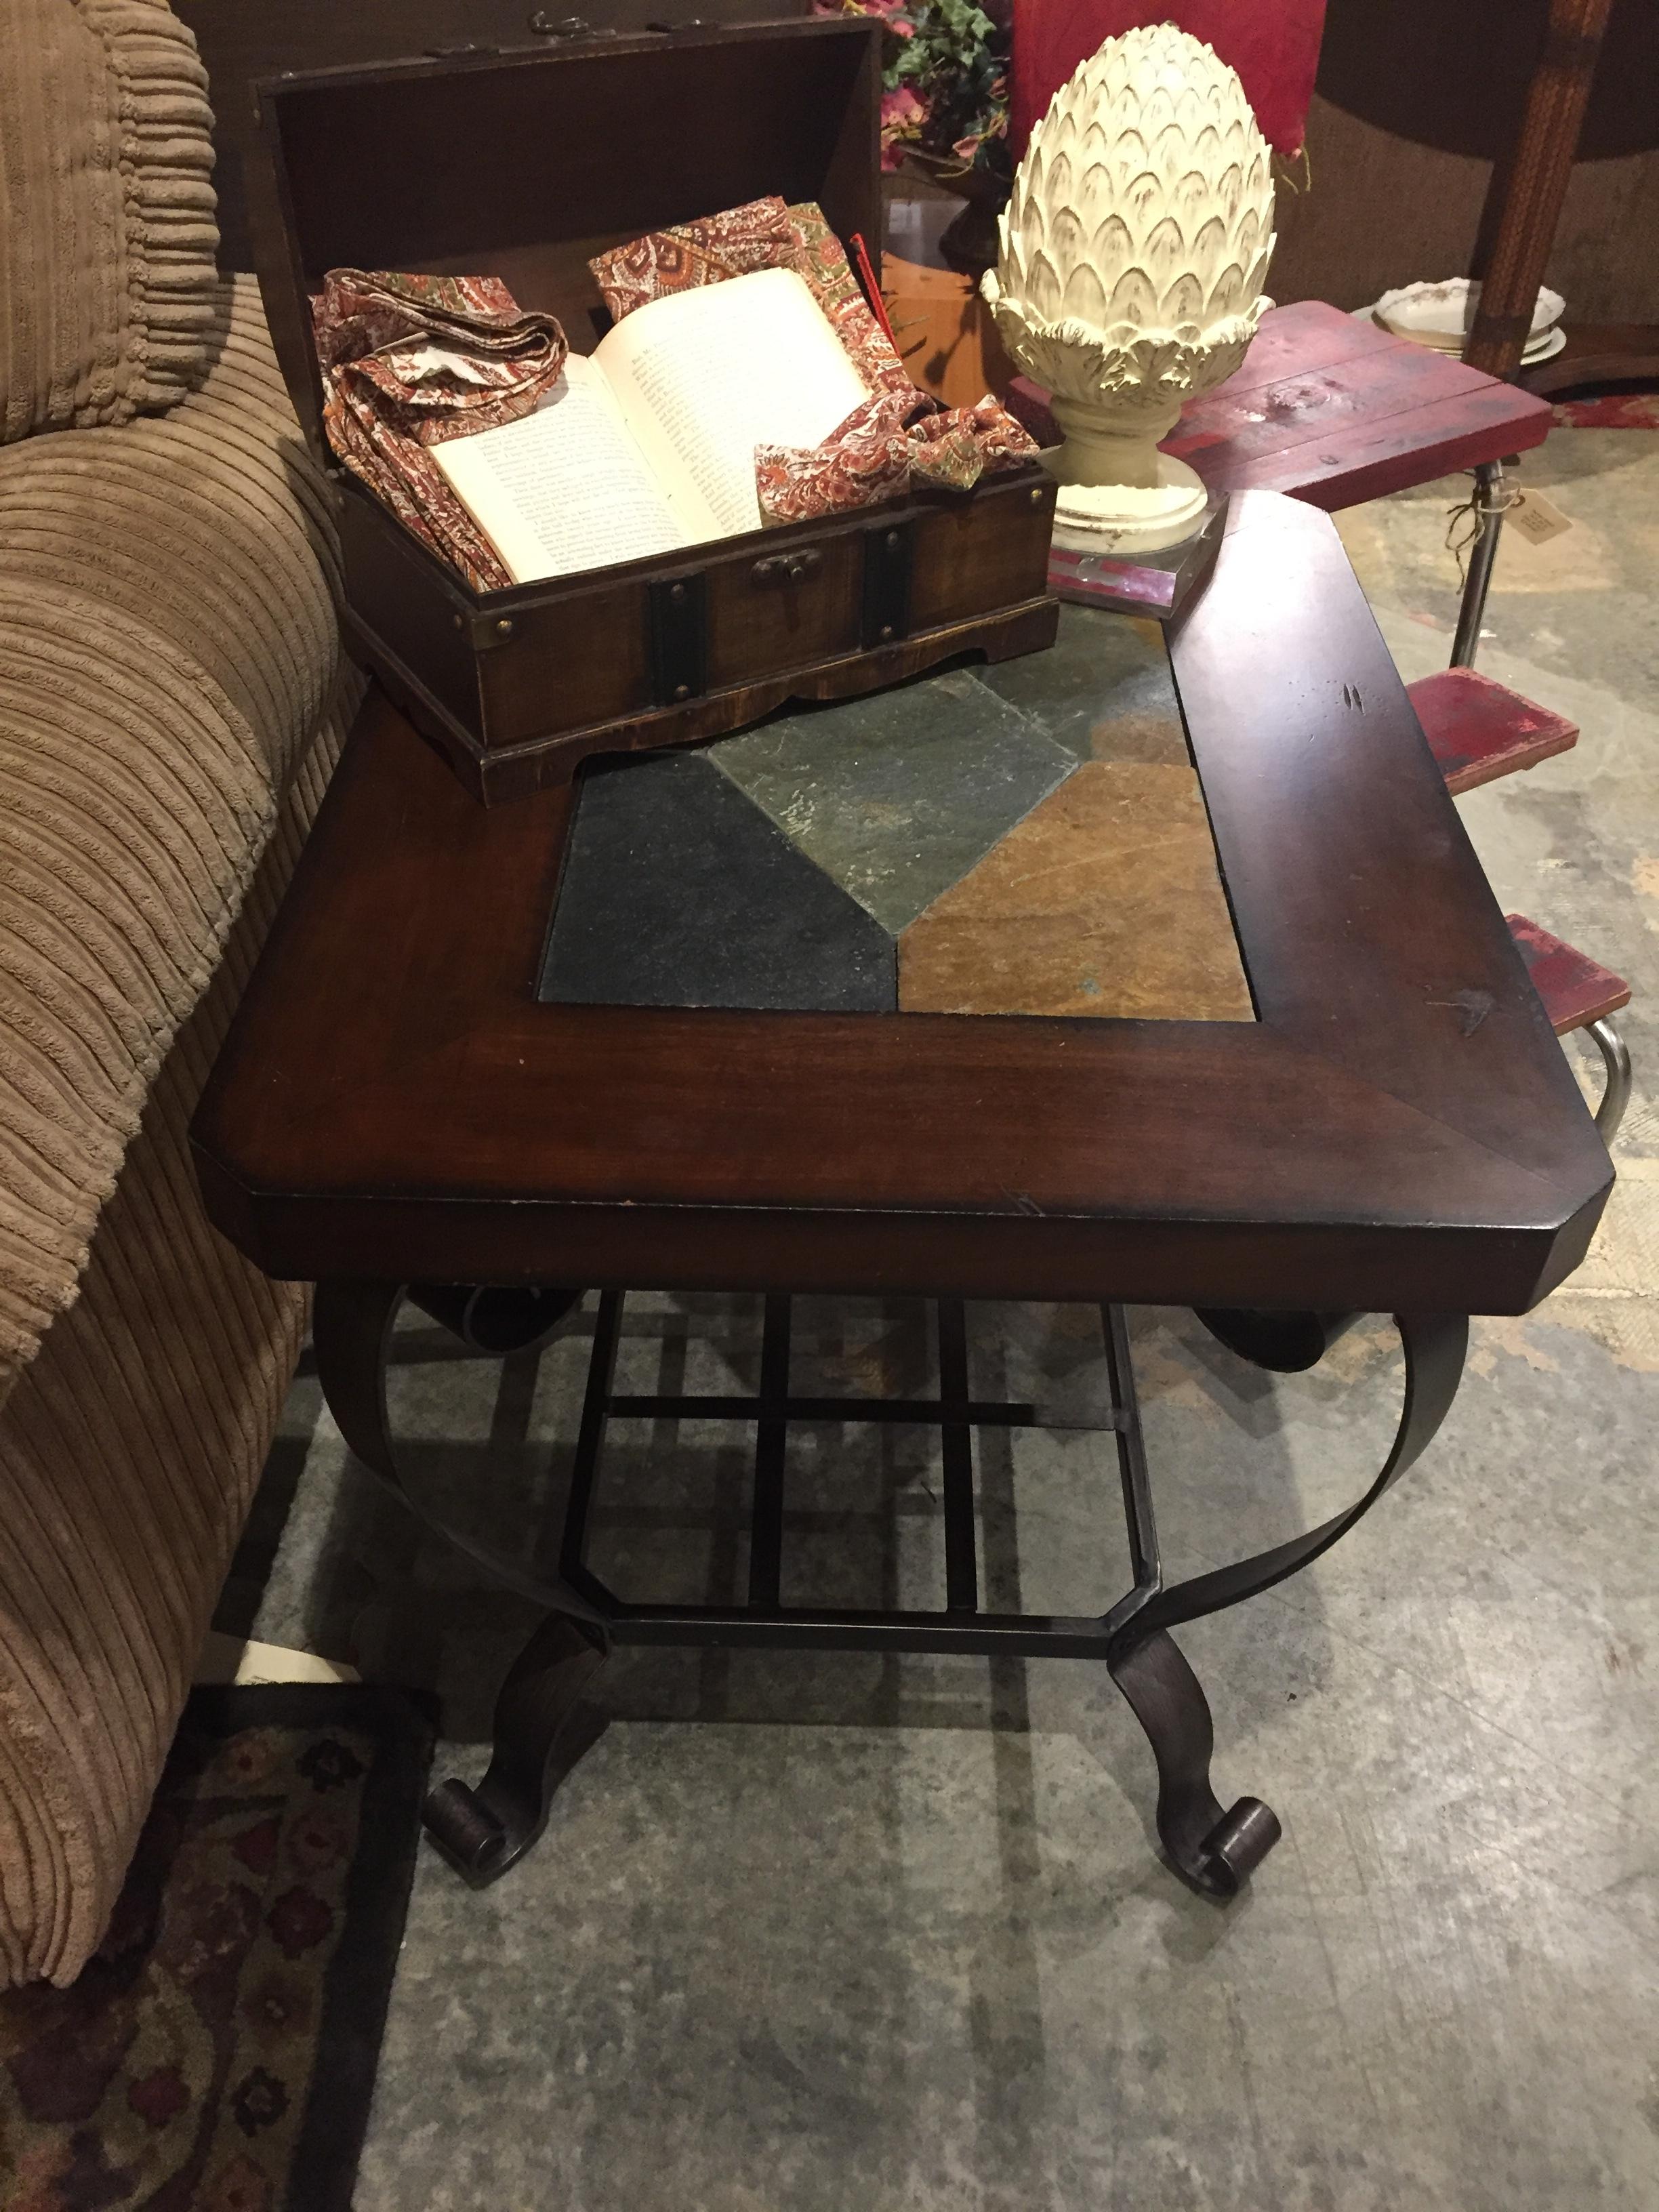 Slate Top End Table $79.95 - C1054 22746